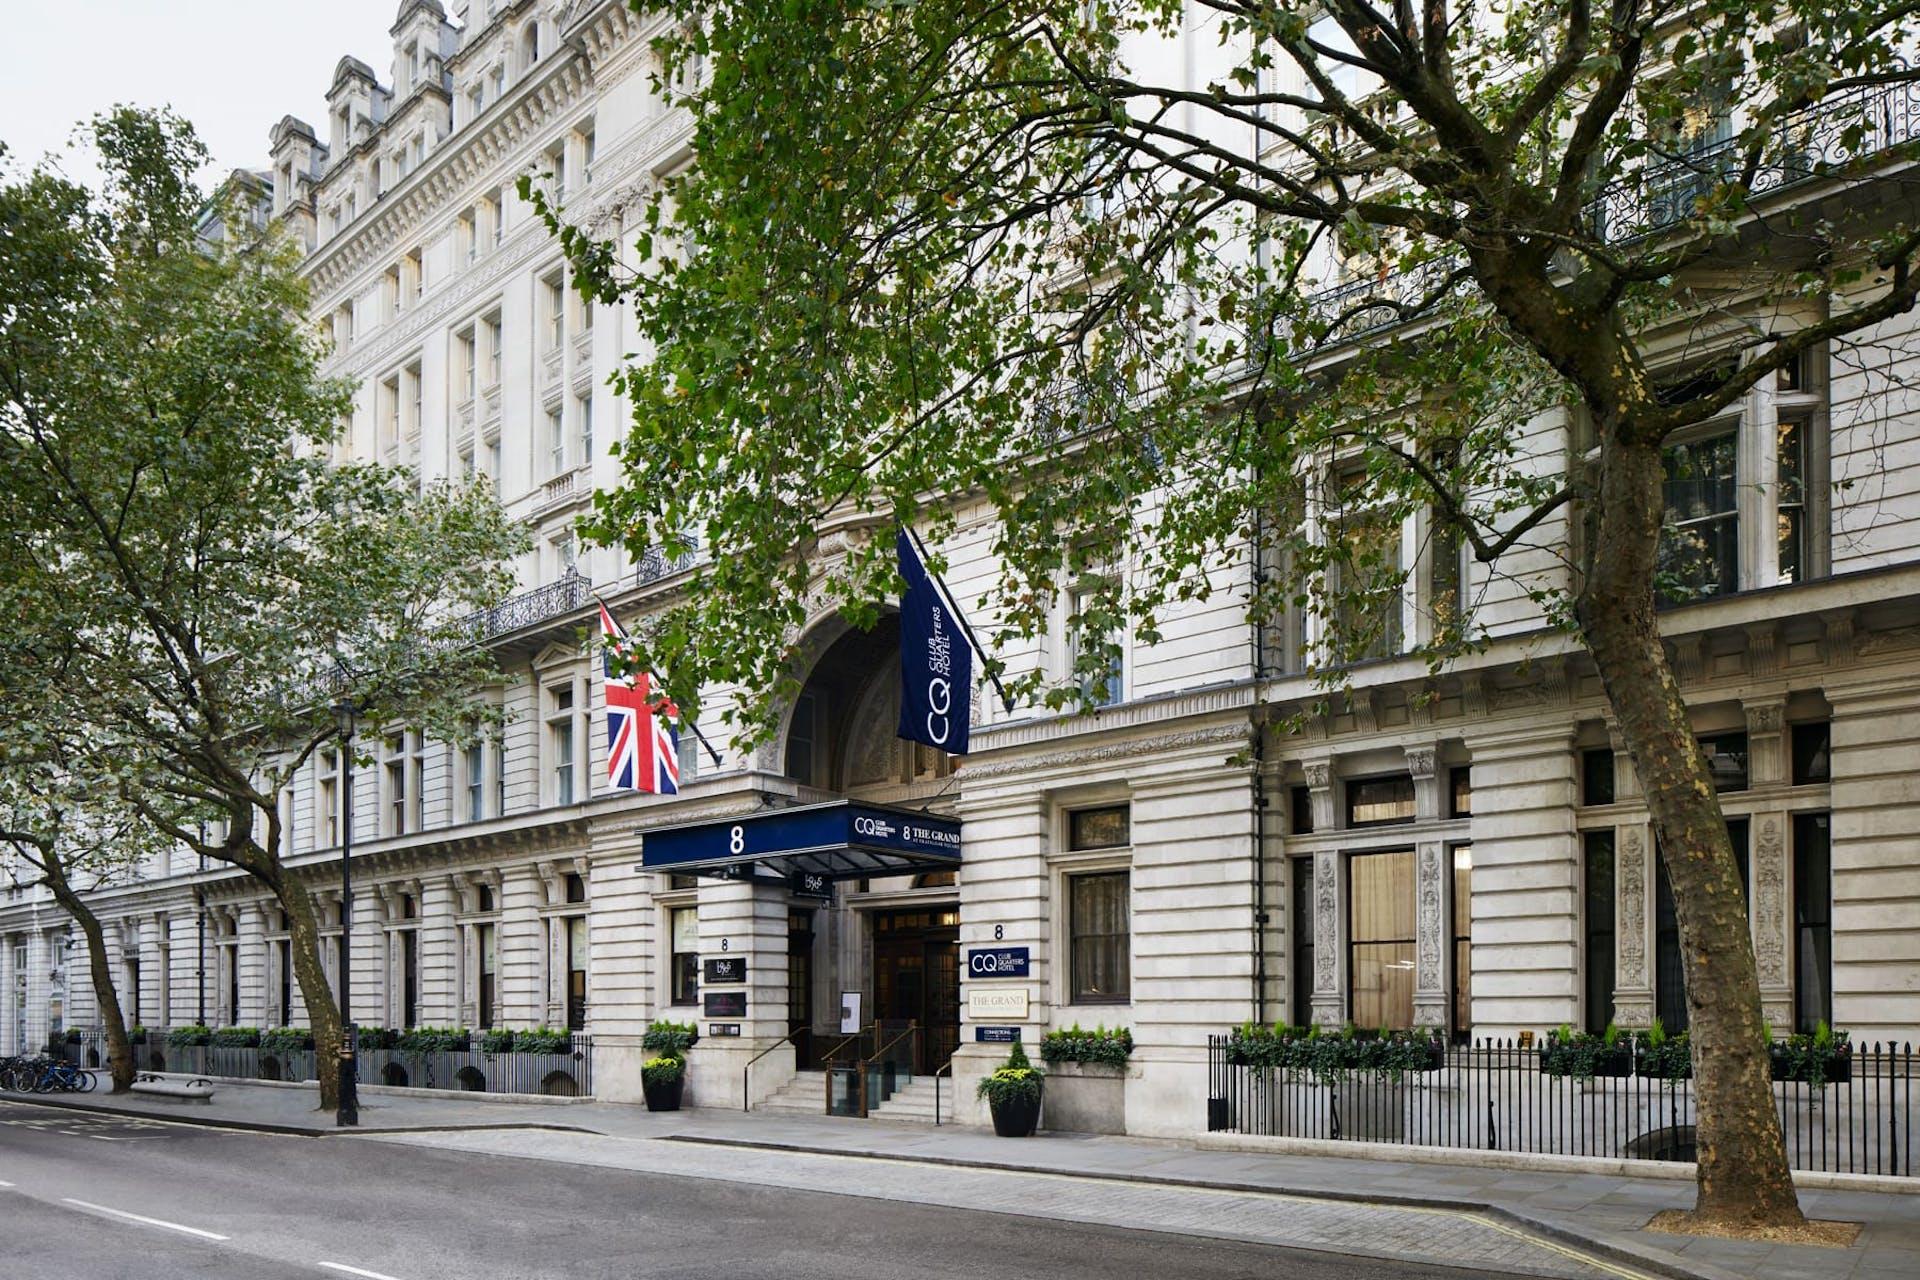 Exterior of CQ hotel, Trafalgar Square, London